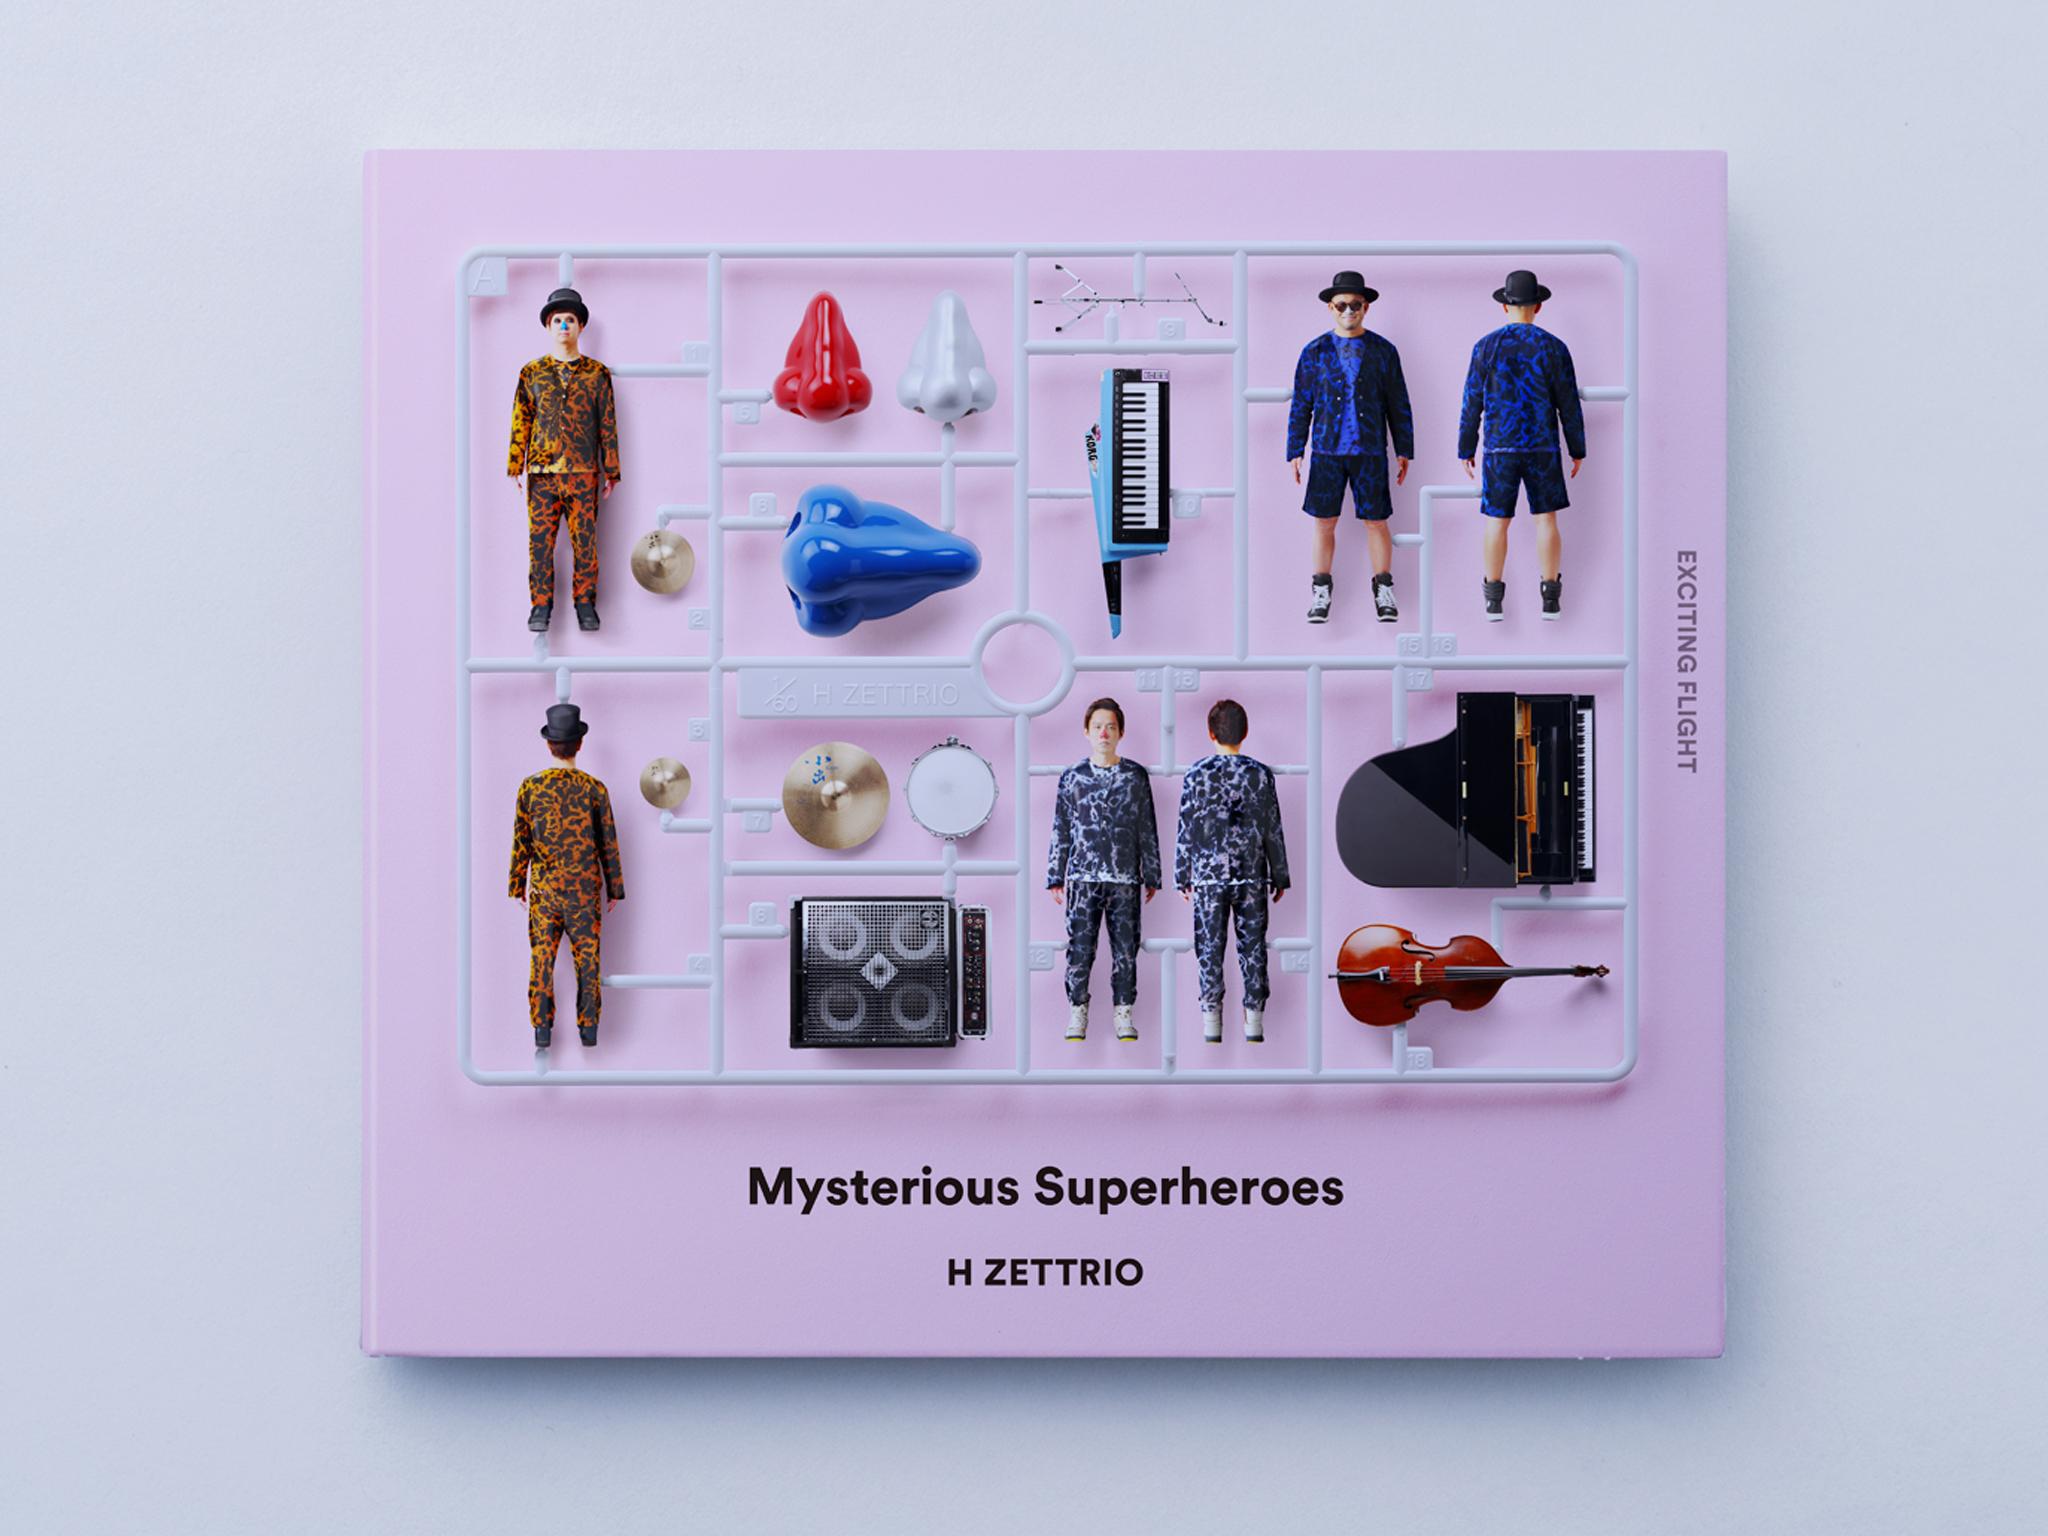 H ZETTRIO『Mysterious Superheroes』